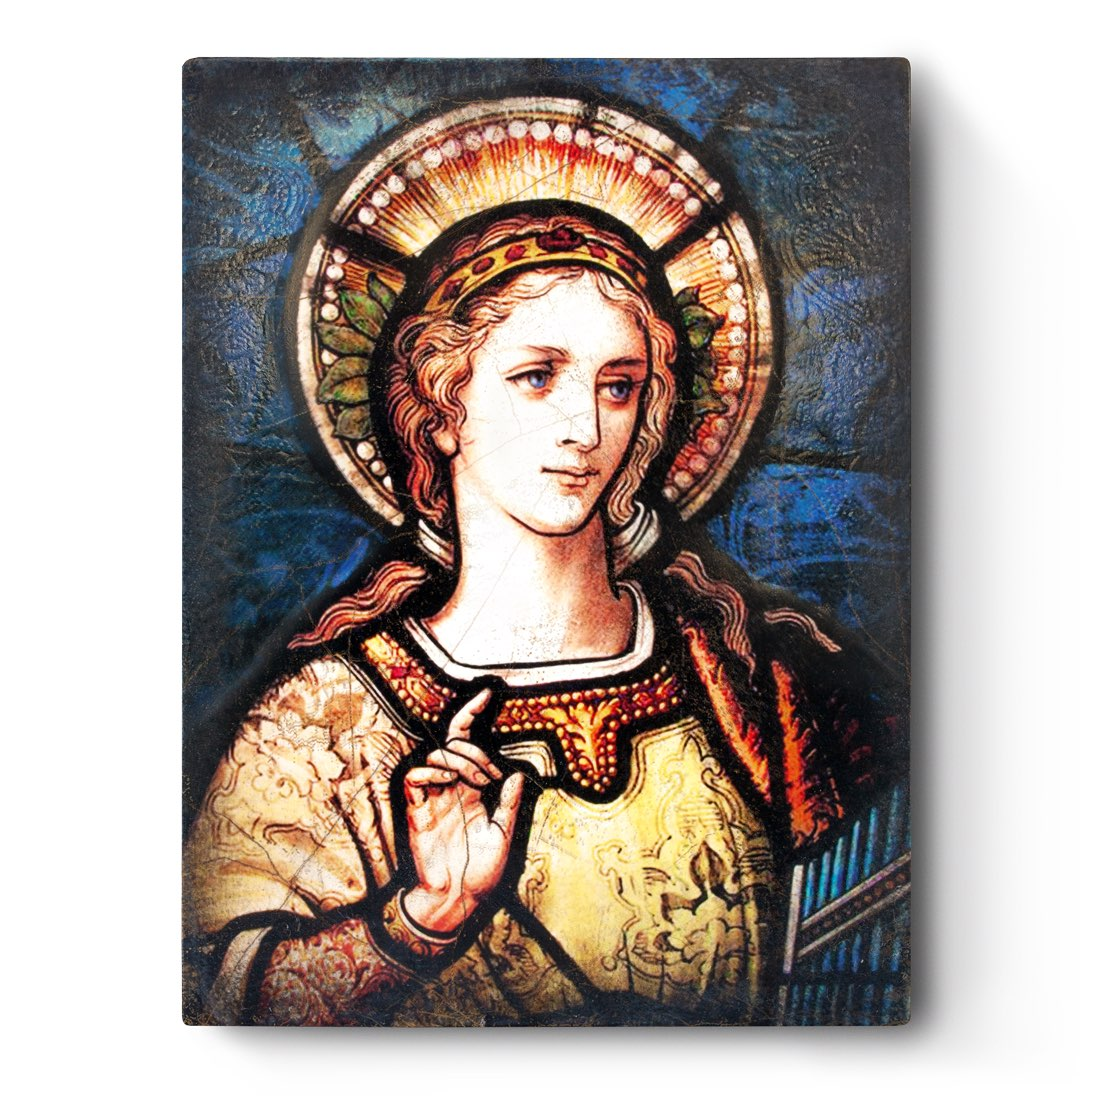 T495 - Saint Cecilia *retired* - Memory Block Sid Dickens